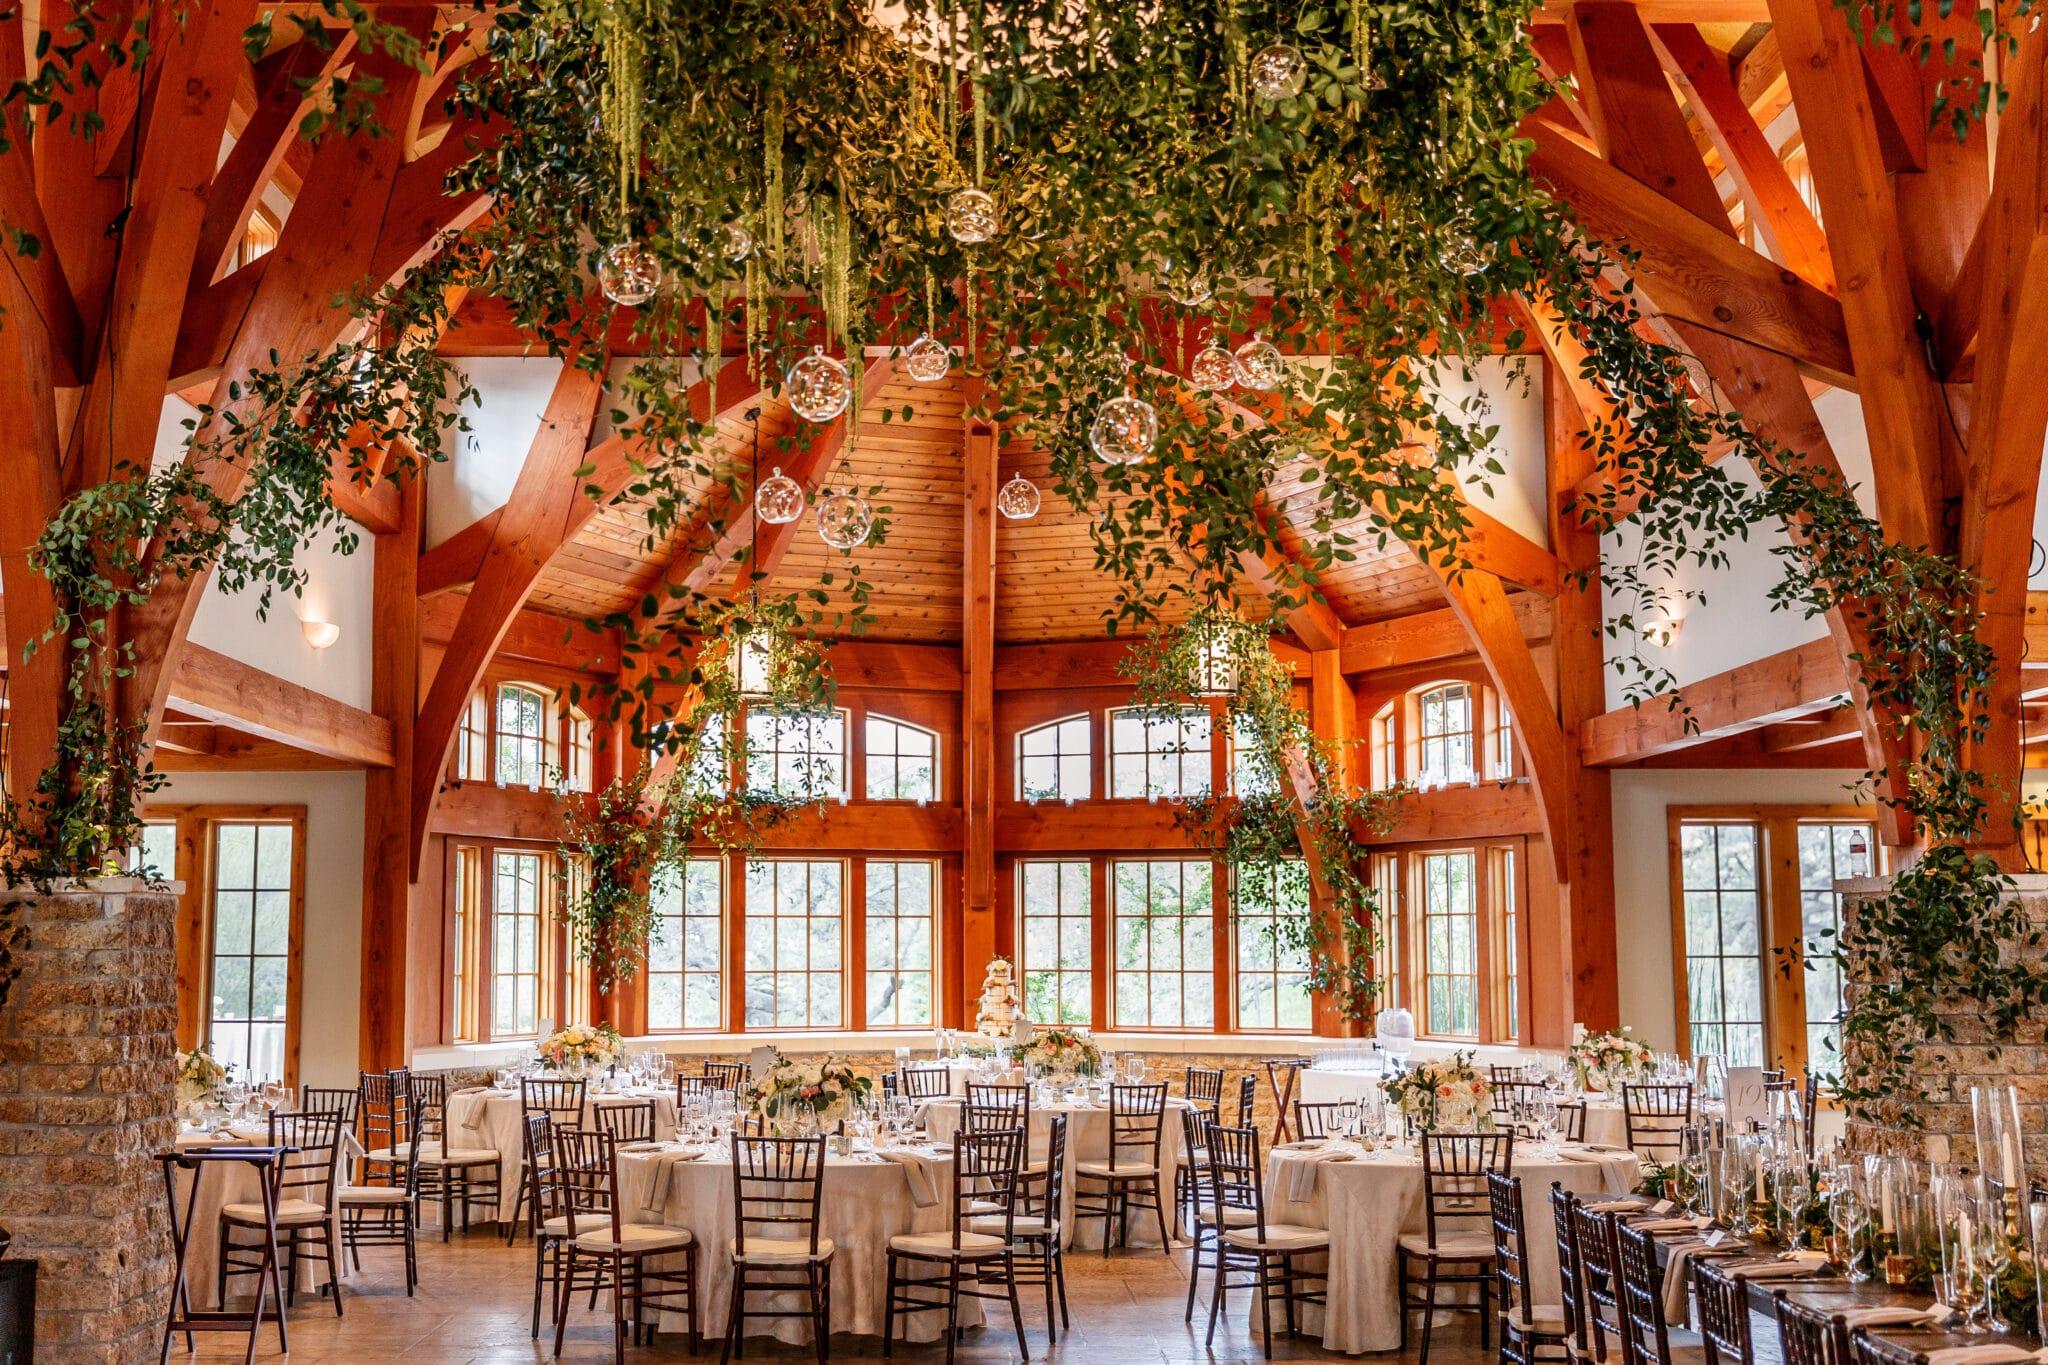 Camp Lucy destination wedding venue